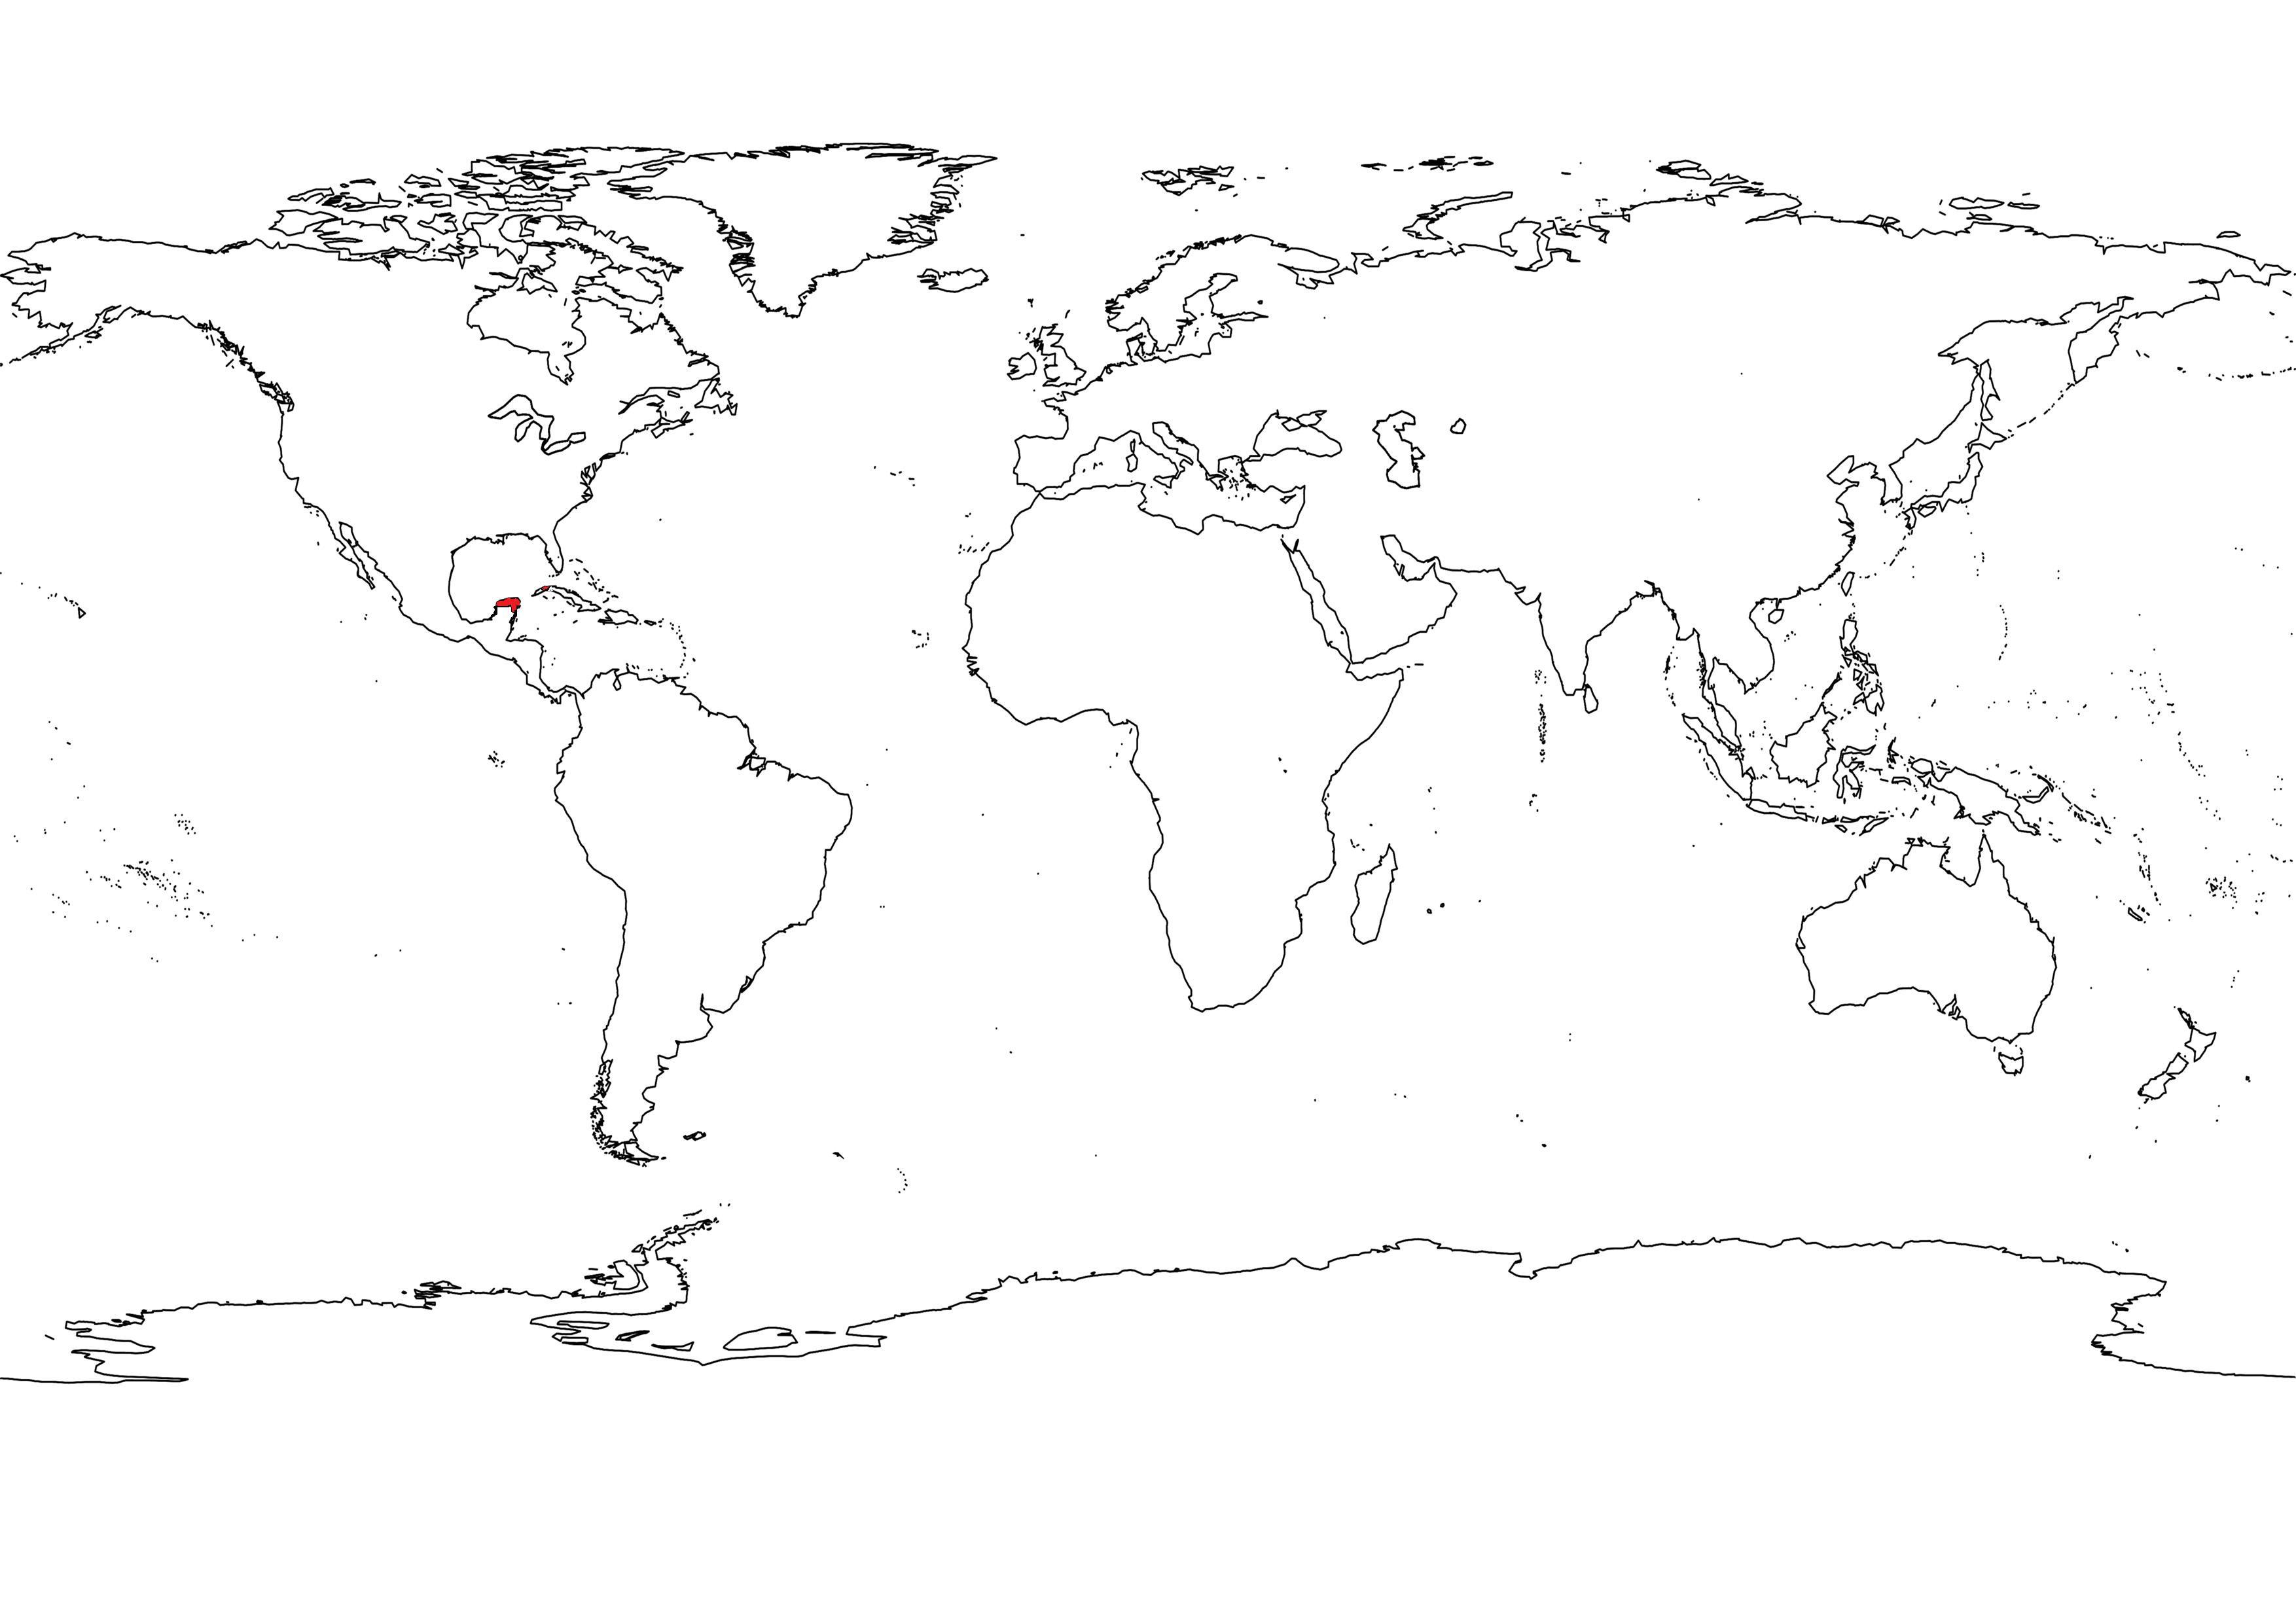 Image outline black white world map2g alternative history outline black white world map2g gumiabroncs Choice Image